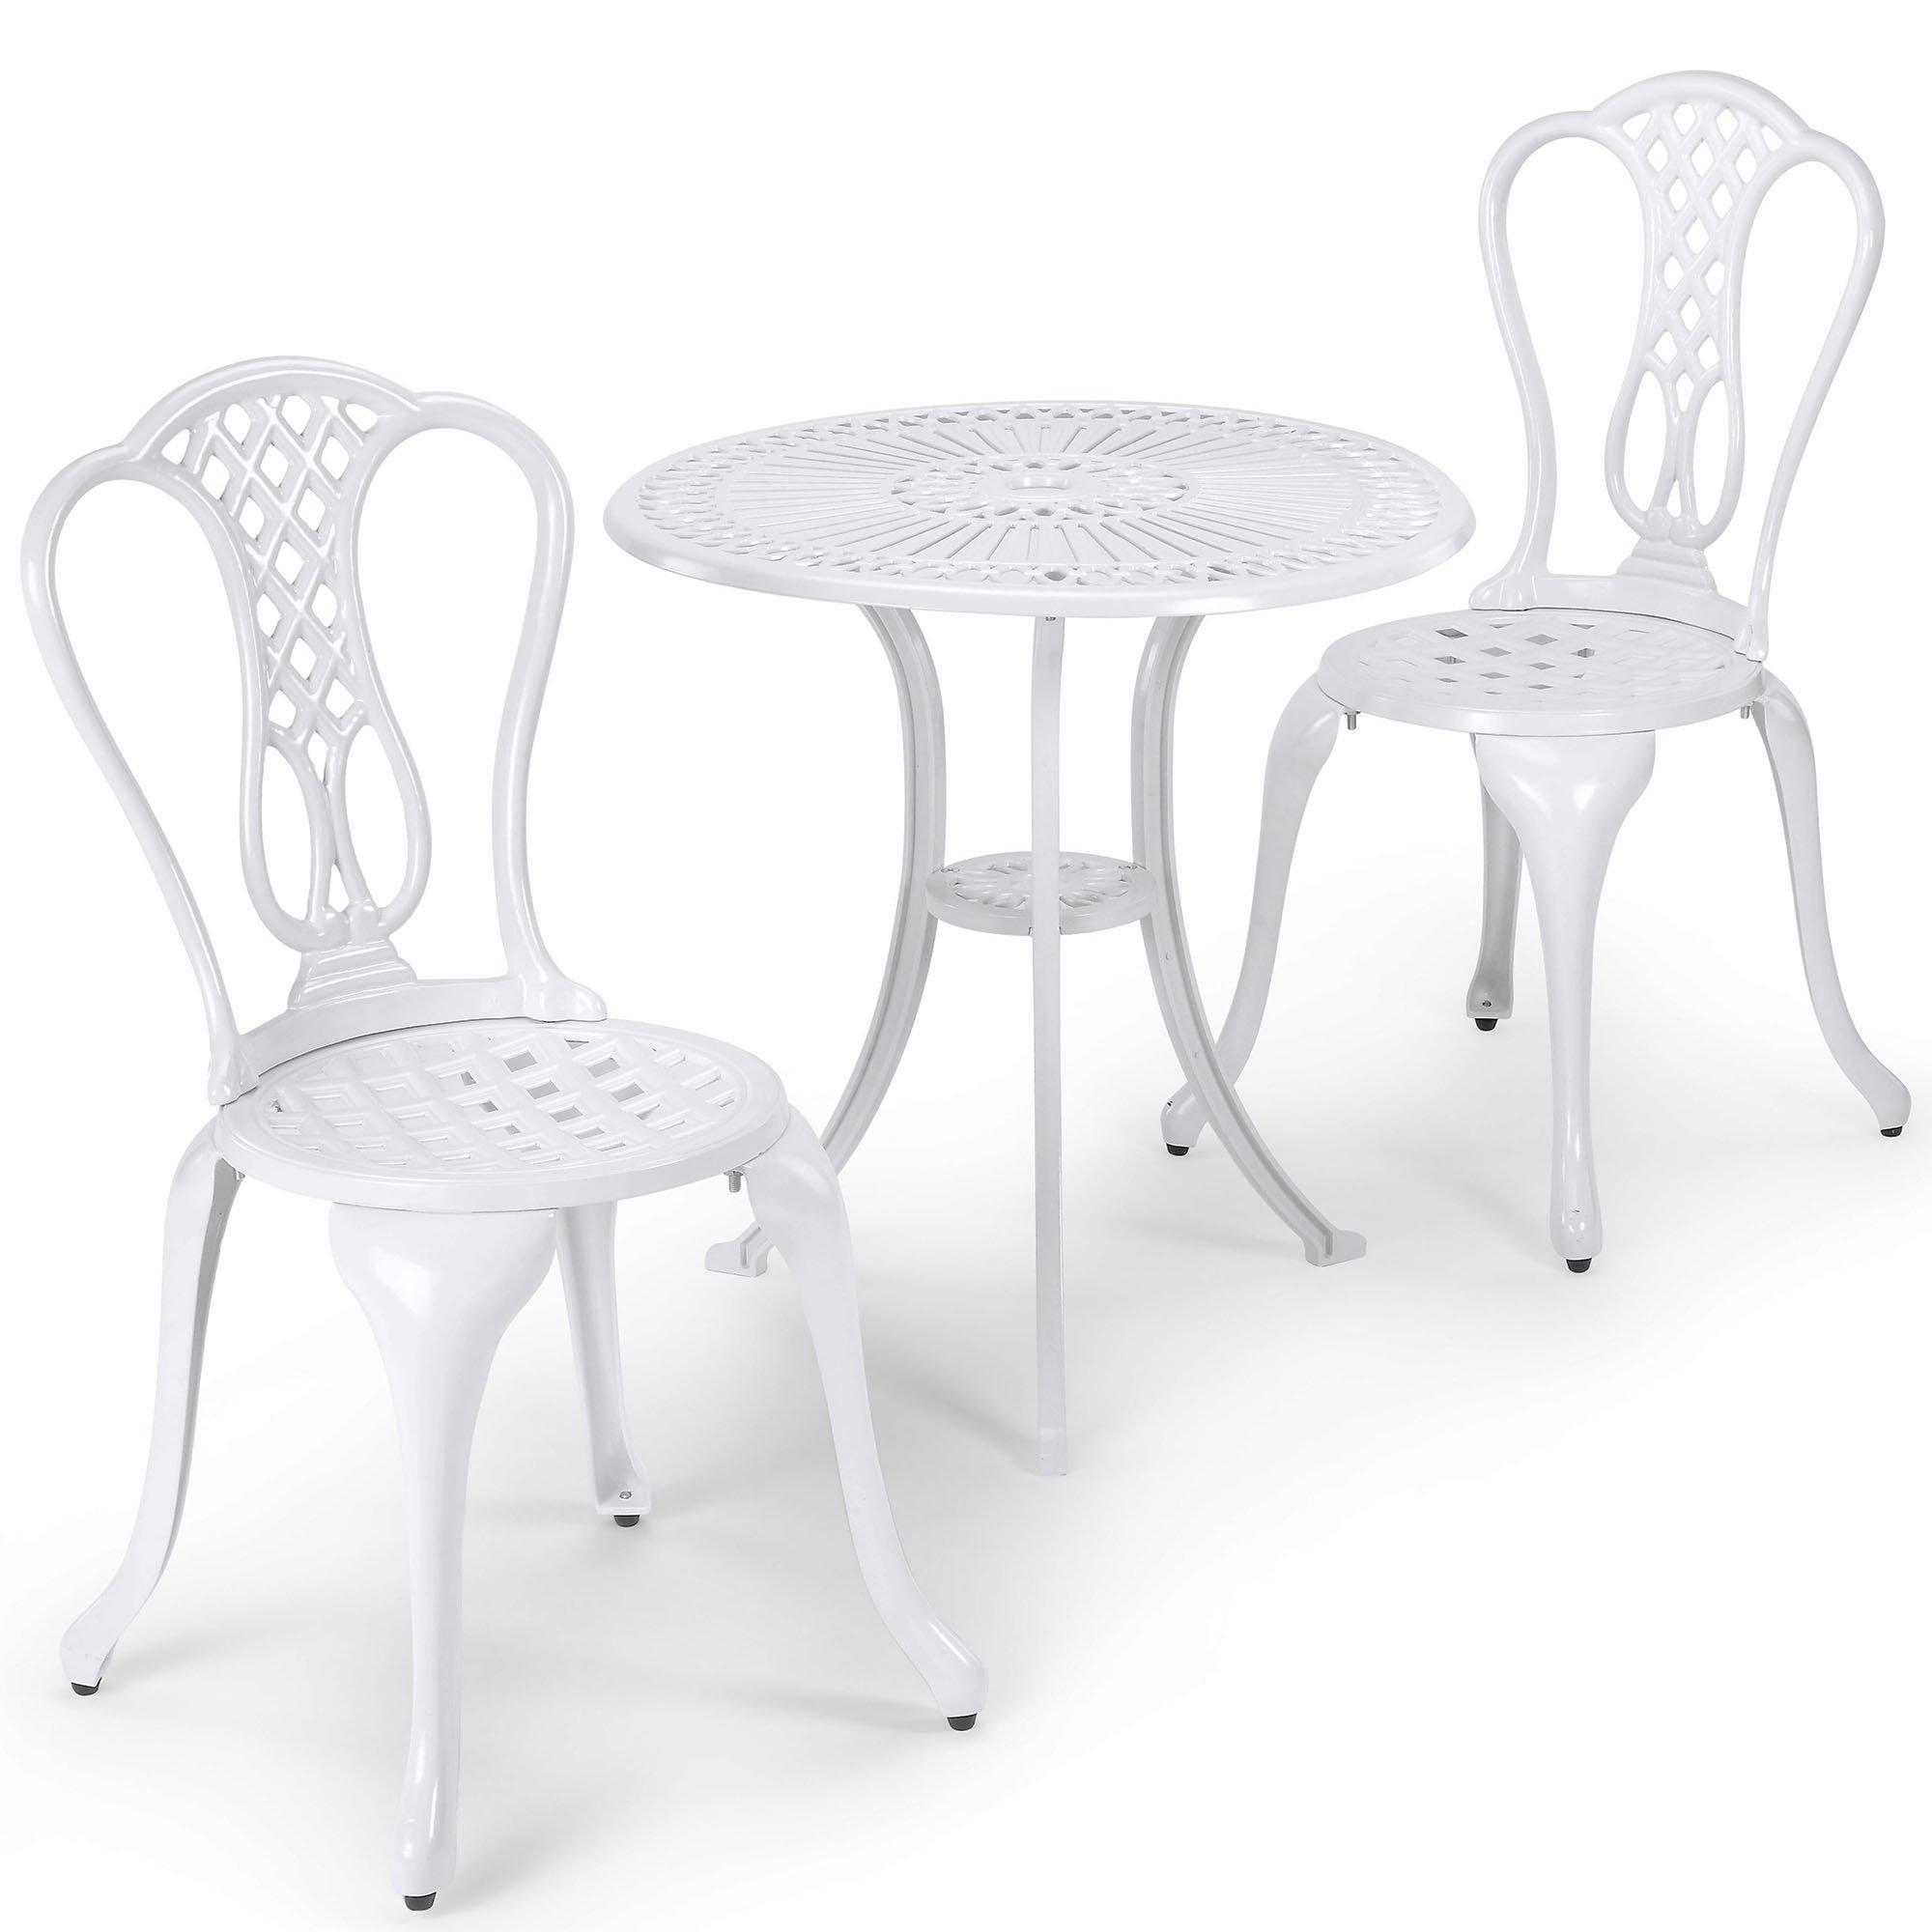 White Bistro Sets: Amazon.co.uk